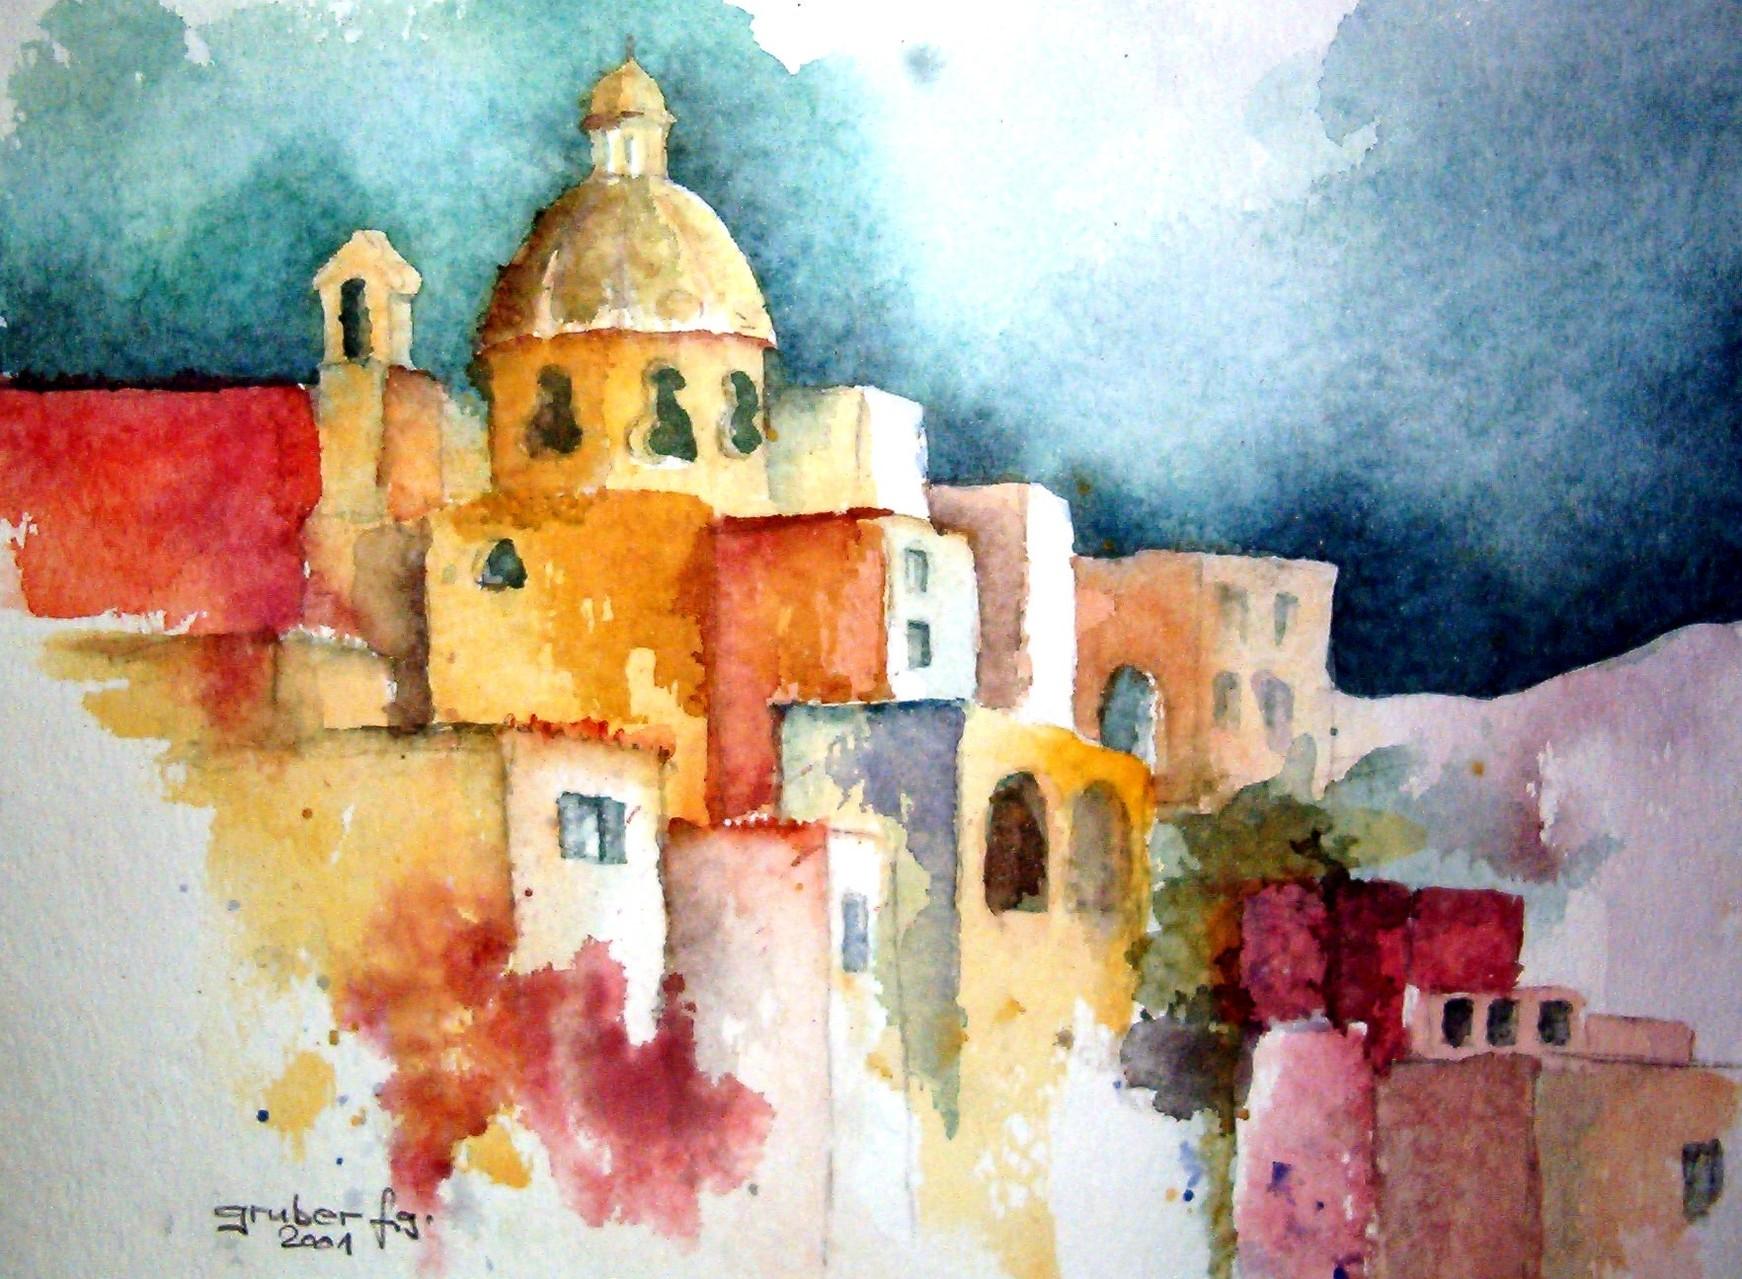 aquarell - impressionen auf der insel procida italien